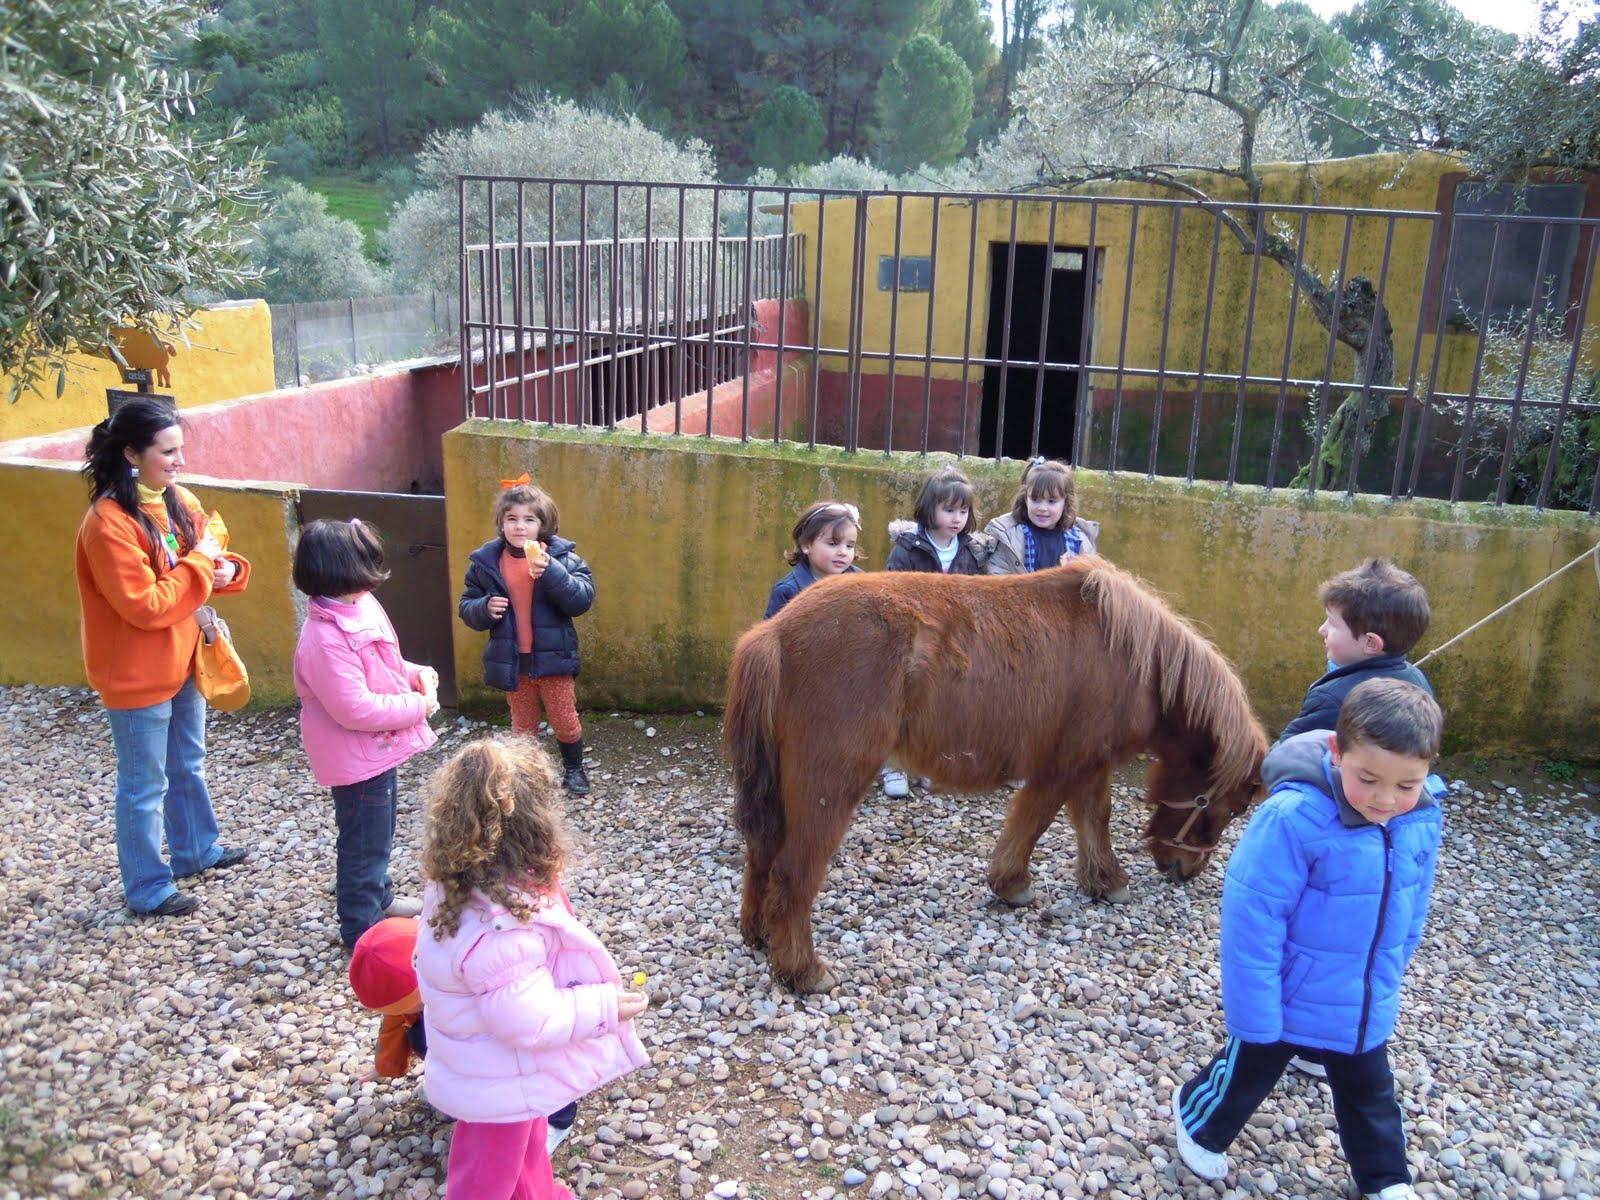 San Sebastian de la Gomer Spain  city images : SAN SEBASTIÁN: Visita a la granja escuela de Cabriñana